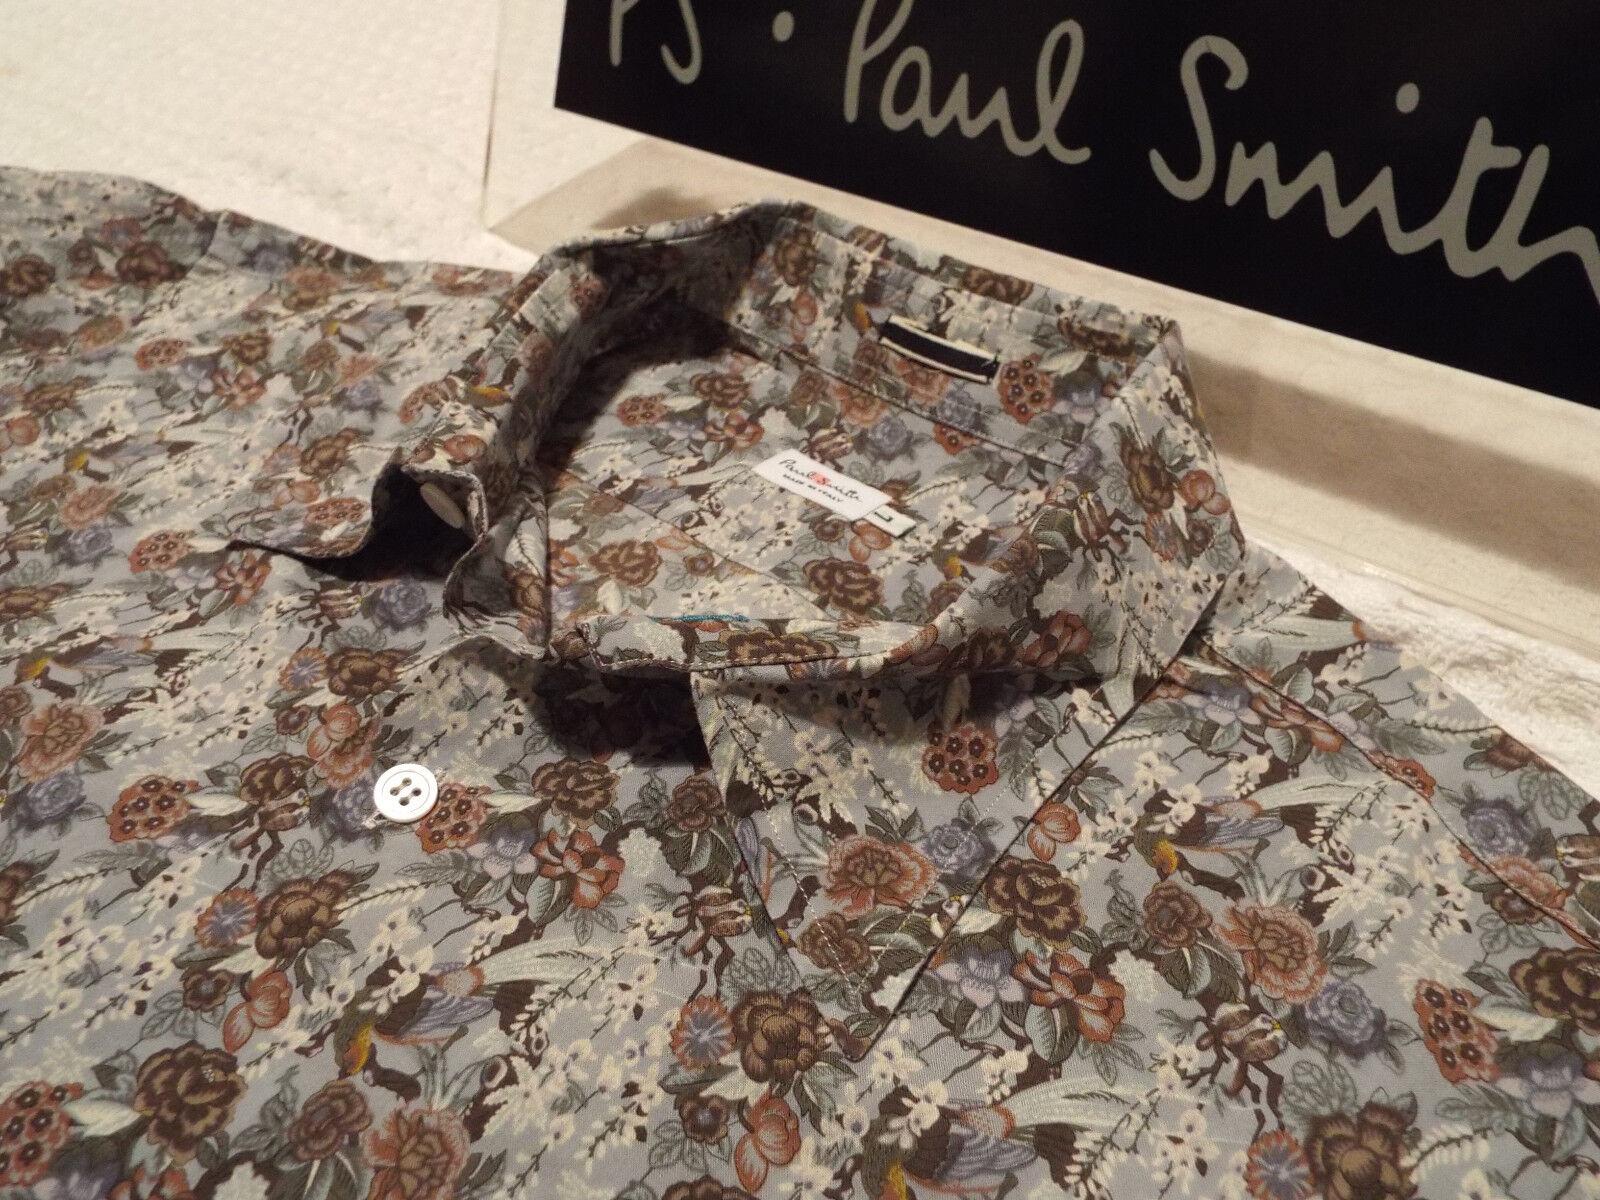 PAUL SMITH Mens MAINLINE Shirt  Size L (CHEST 44 )  RRP + FLORAL STYLE